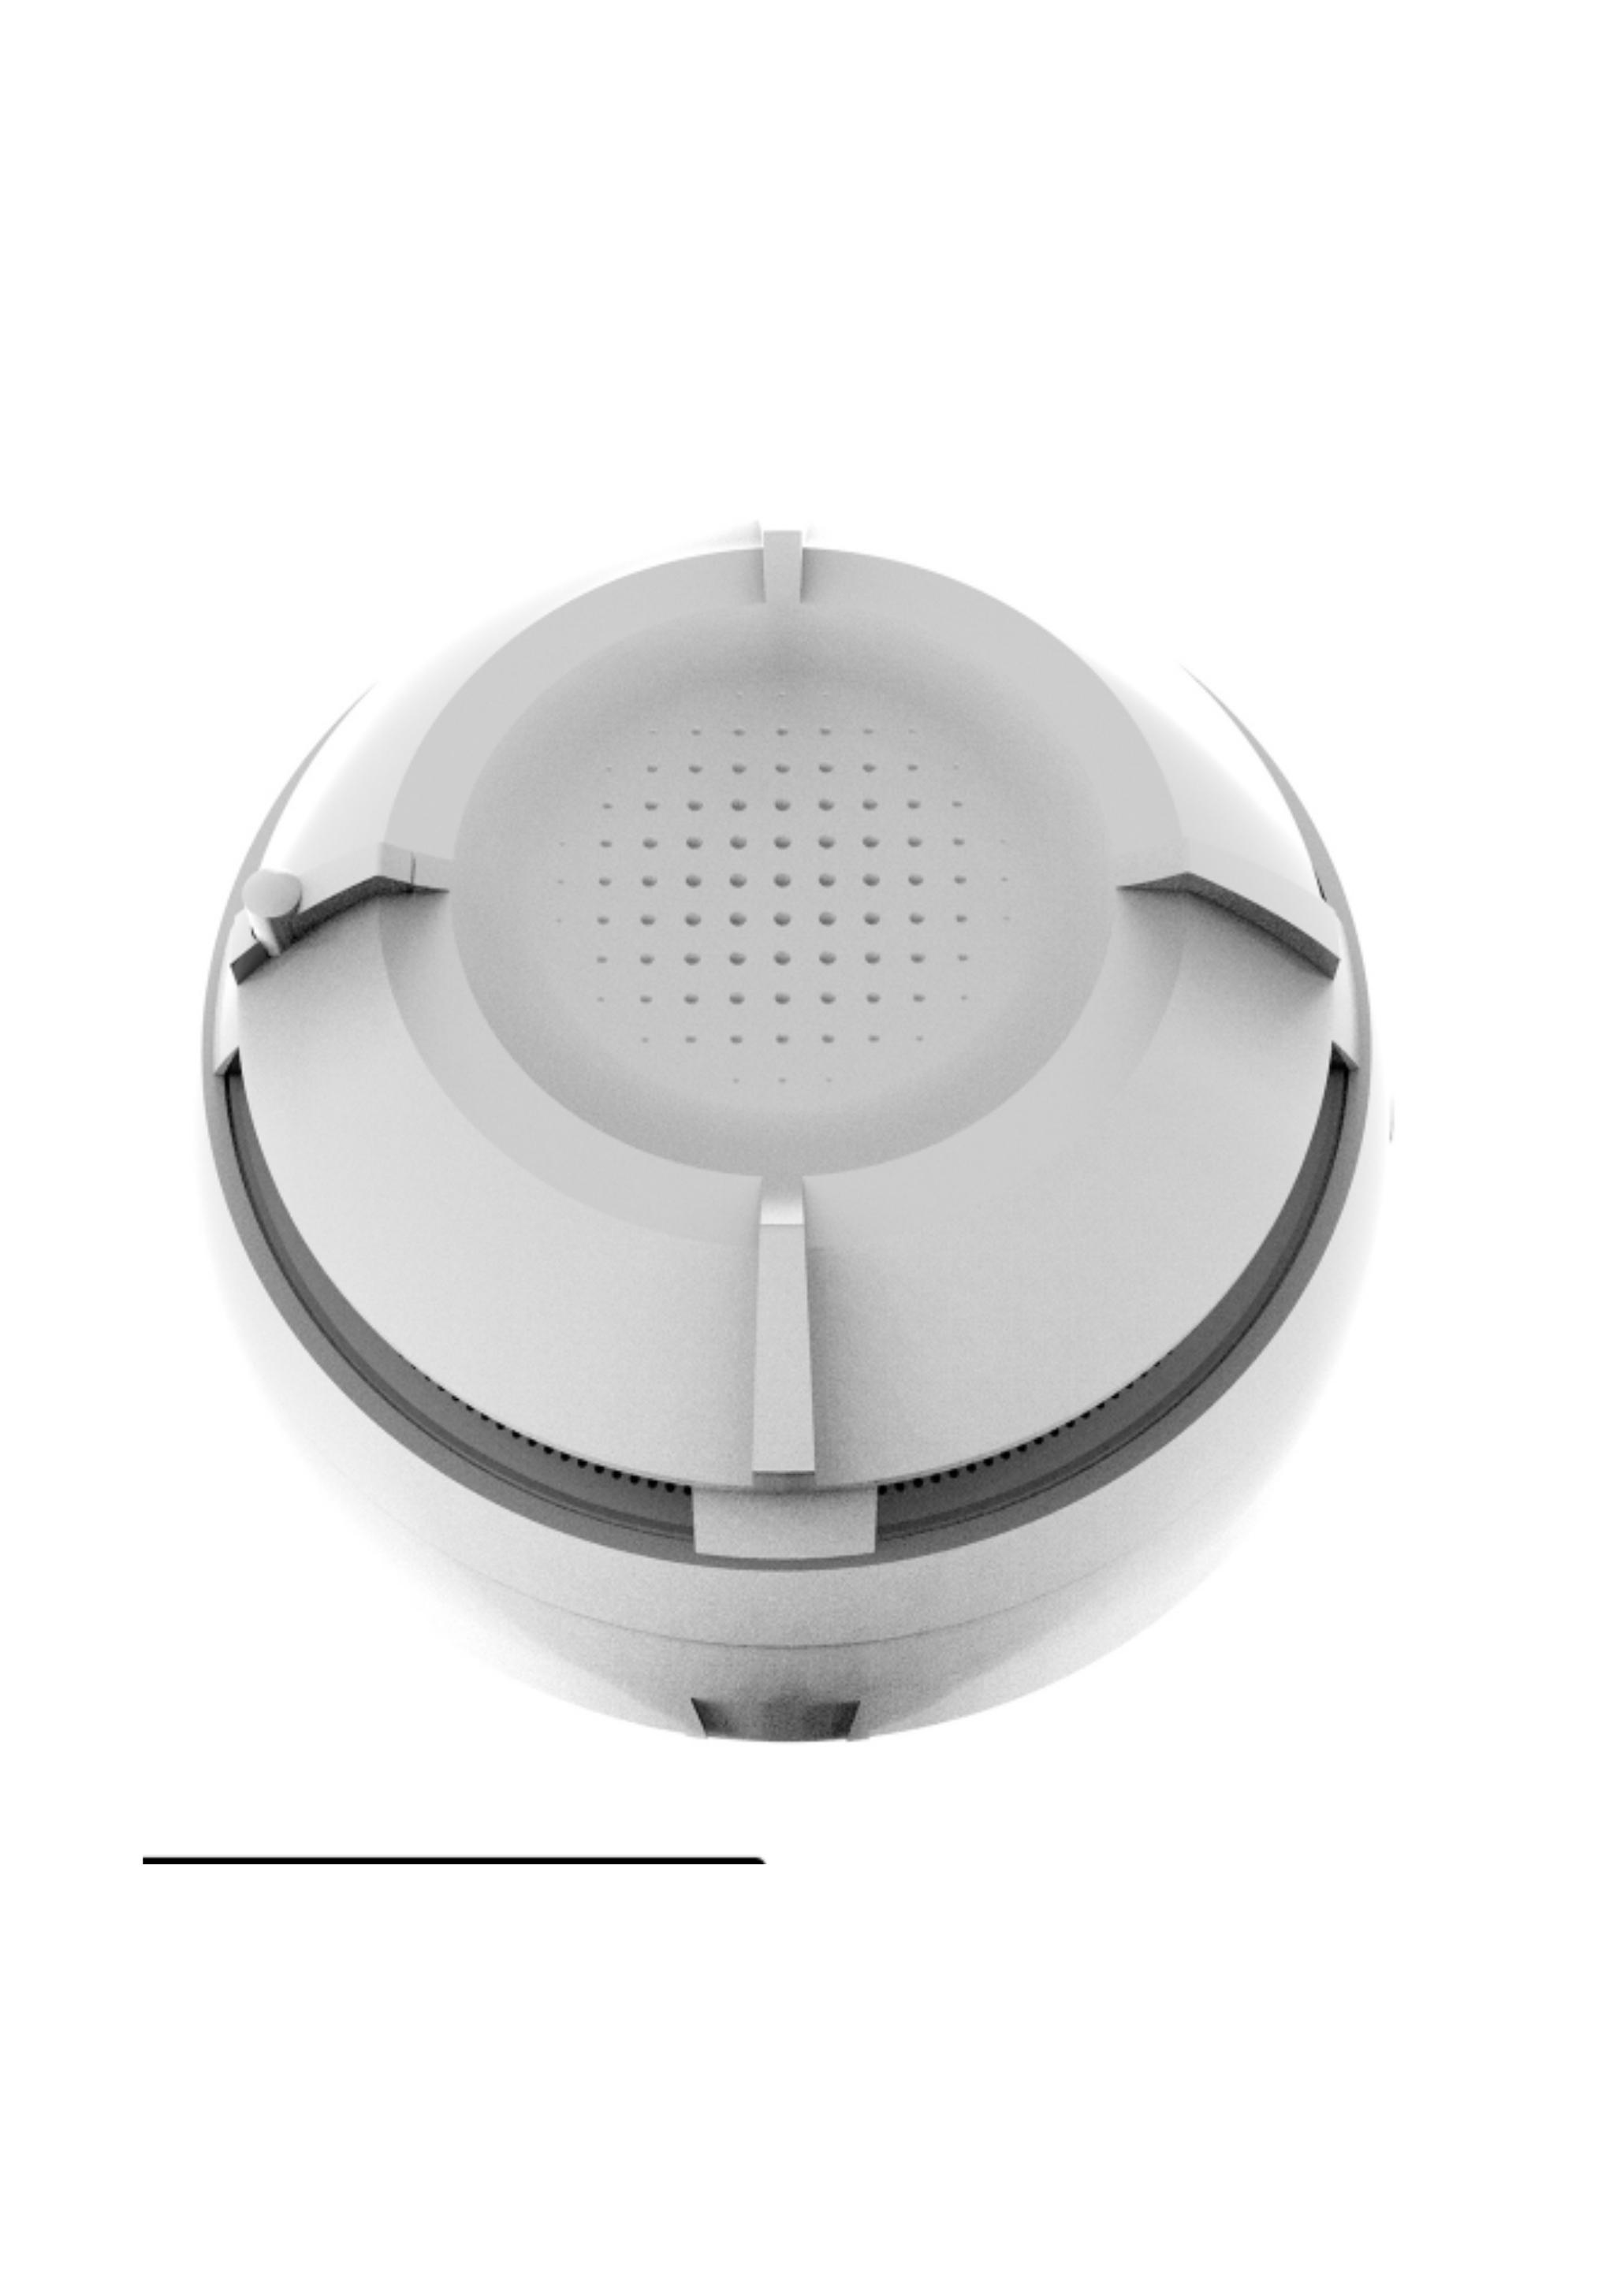 EKHO Hybrid Wireless Multi-Sensor 1610340-00